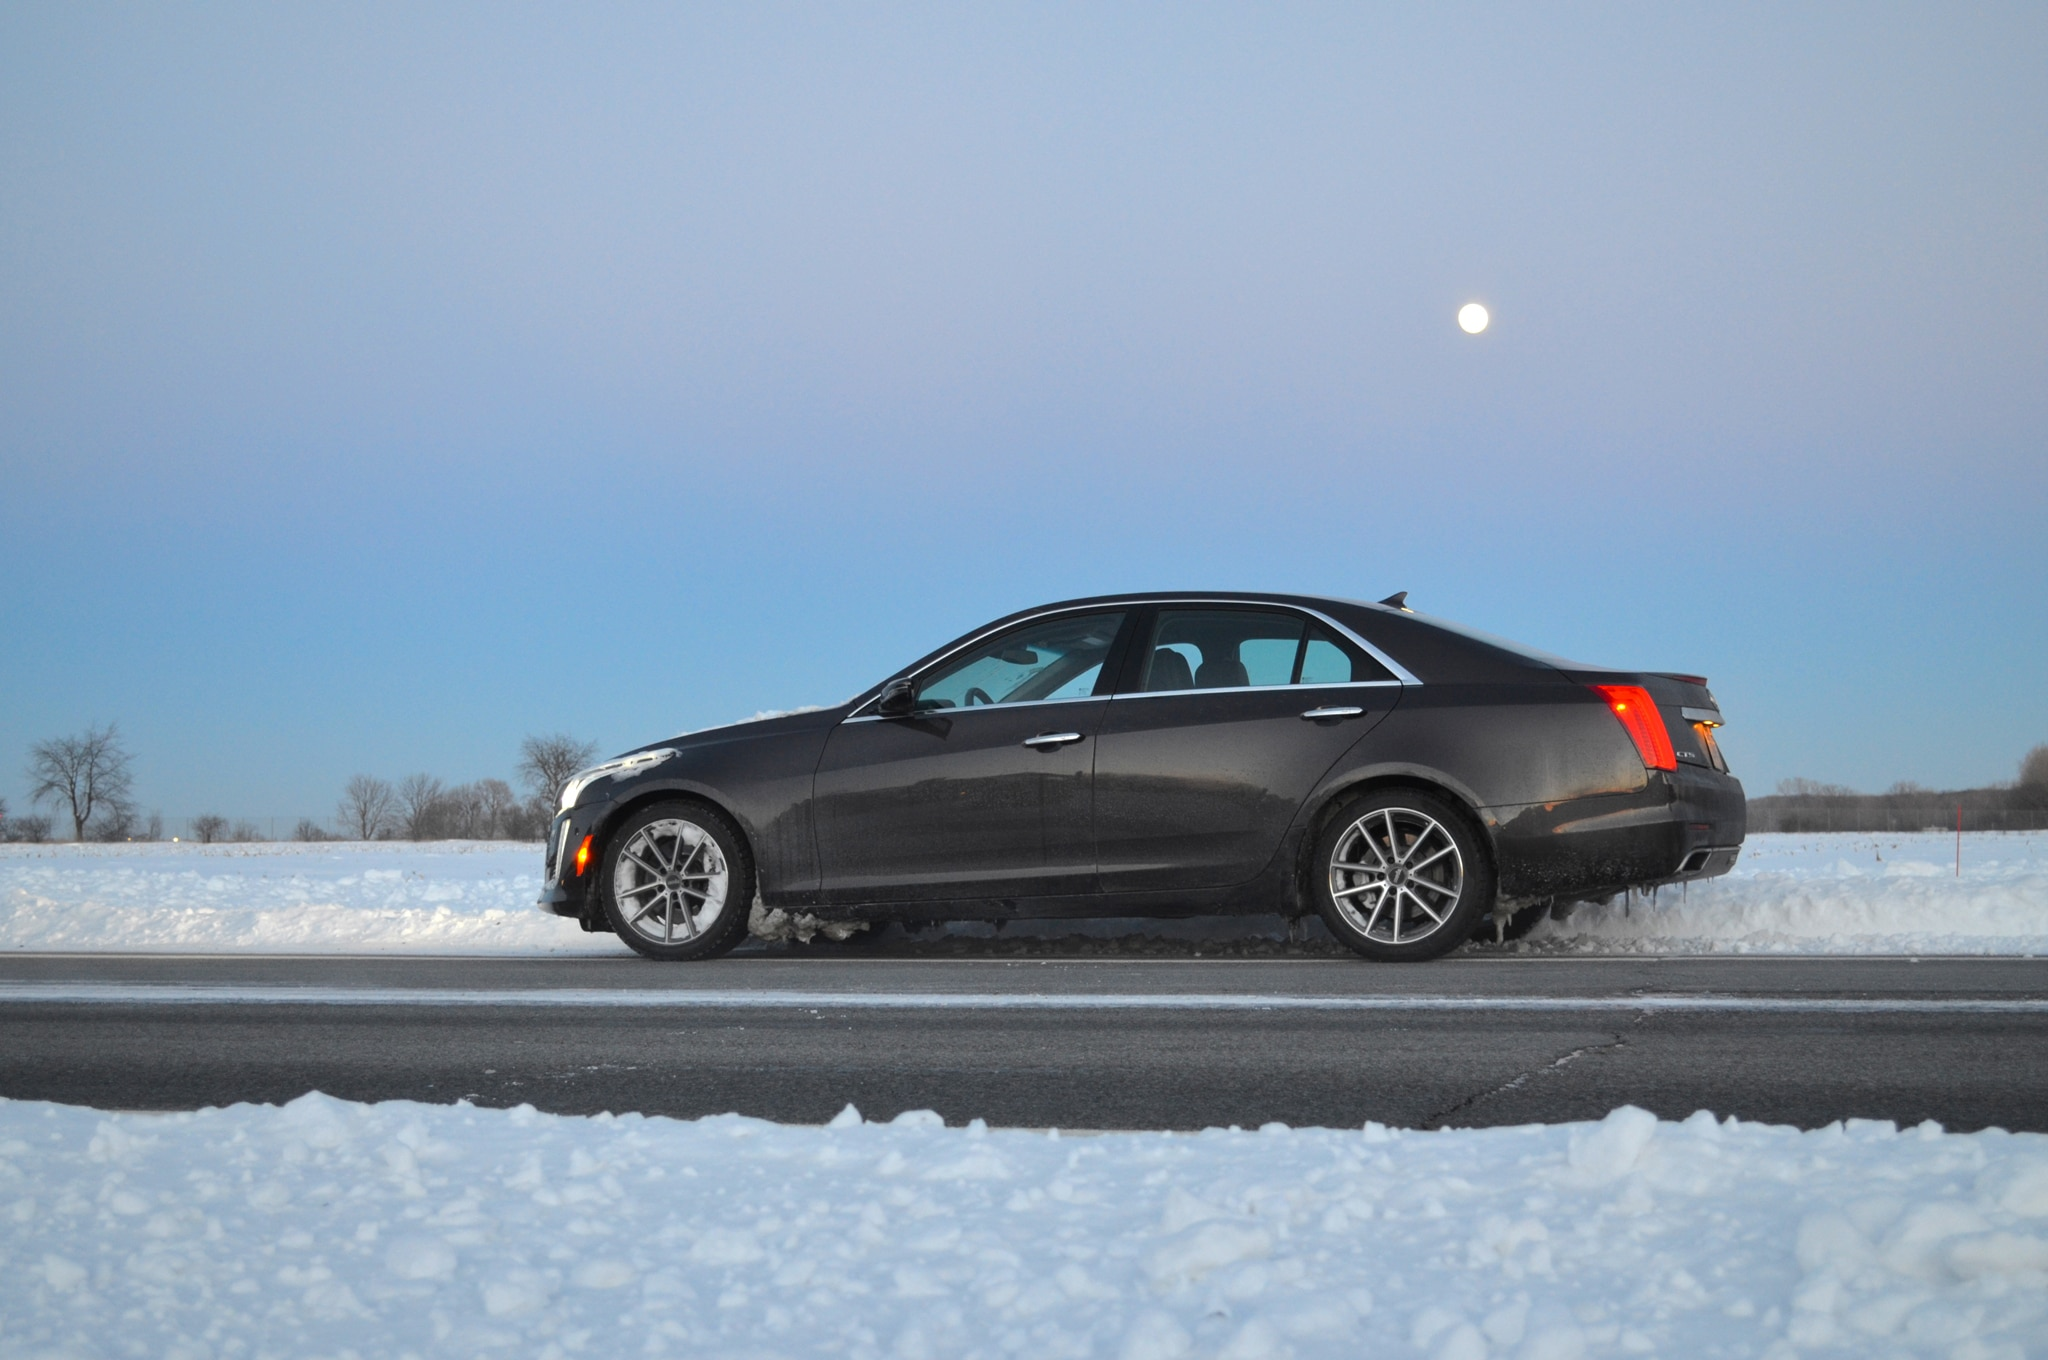 2014 Cadillac CTS Vsport Side Profile 02